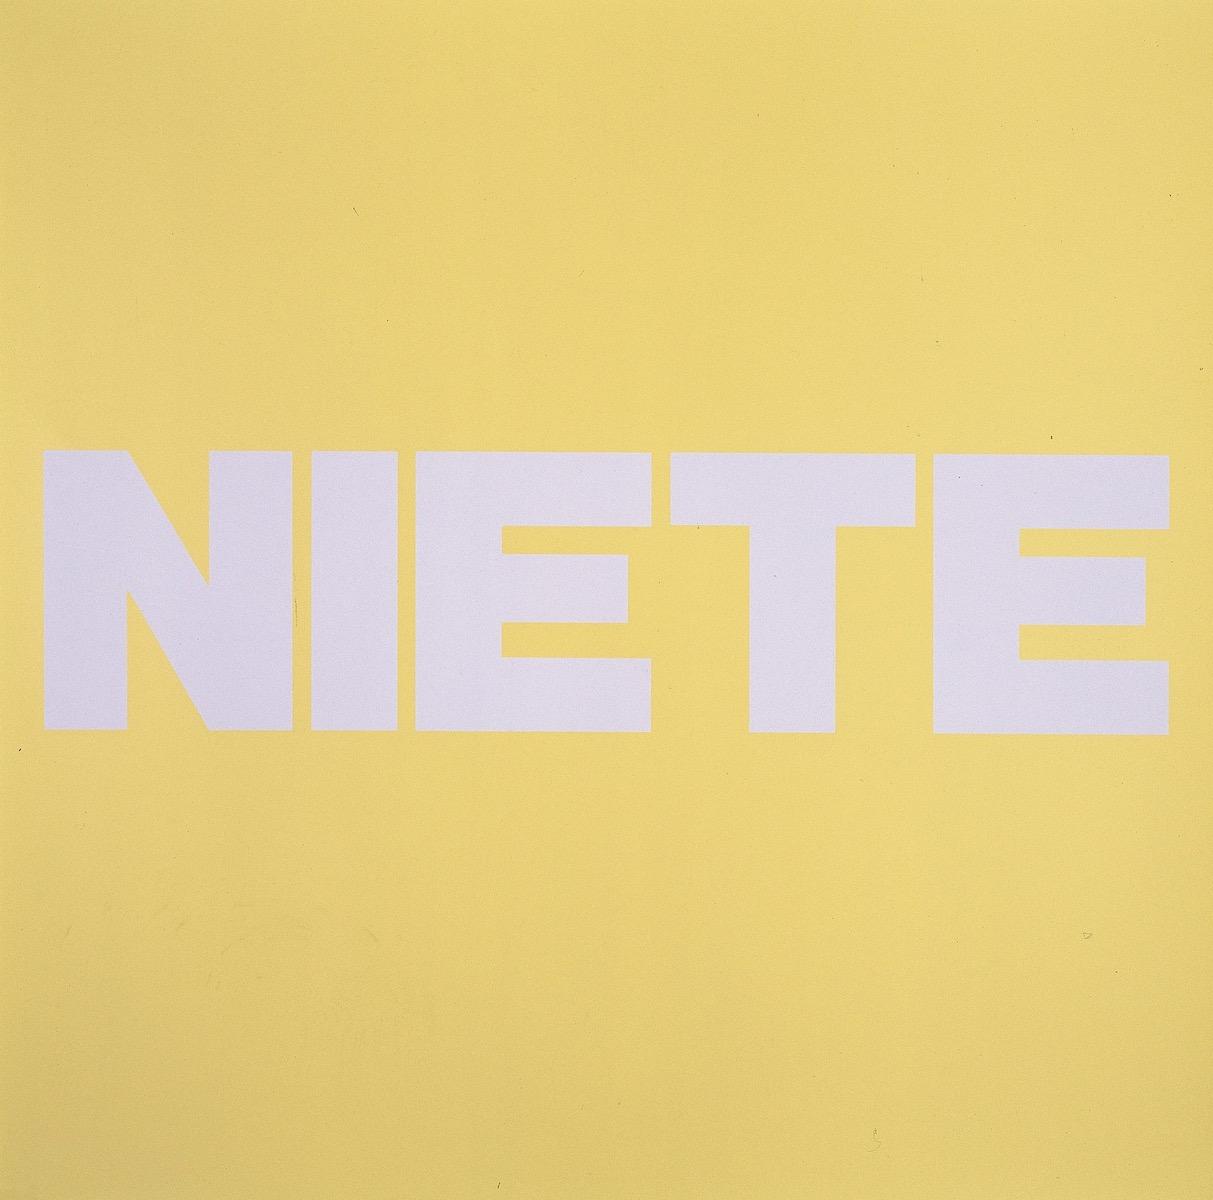 NIETE, GELB | Affirmation tut gut | Angelika Beuler | 1992